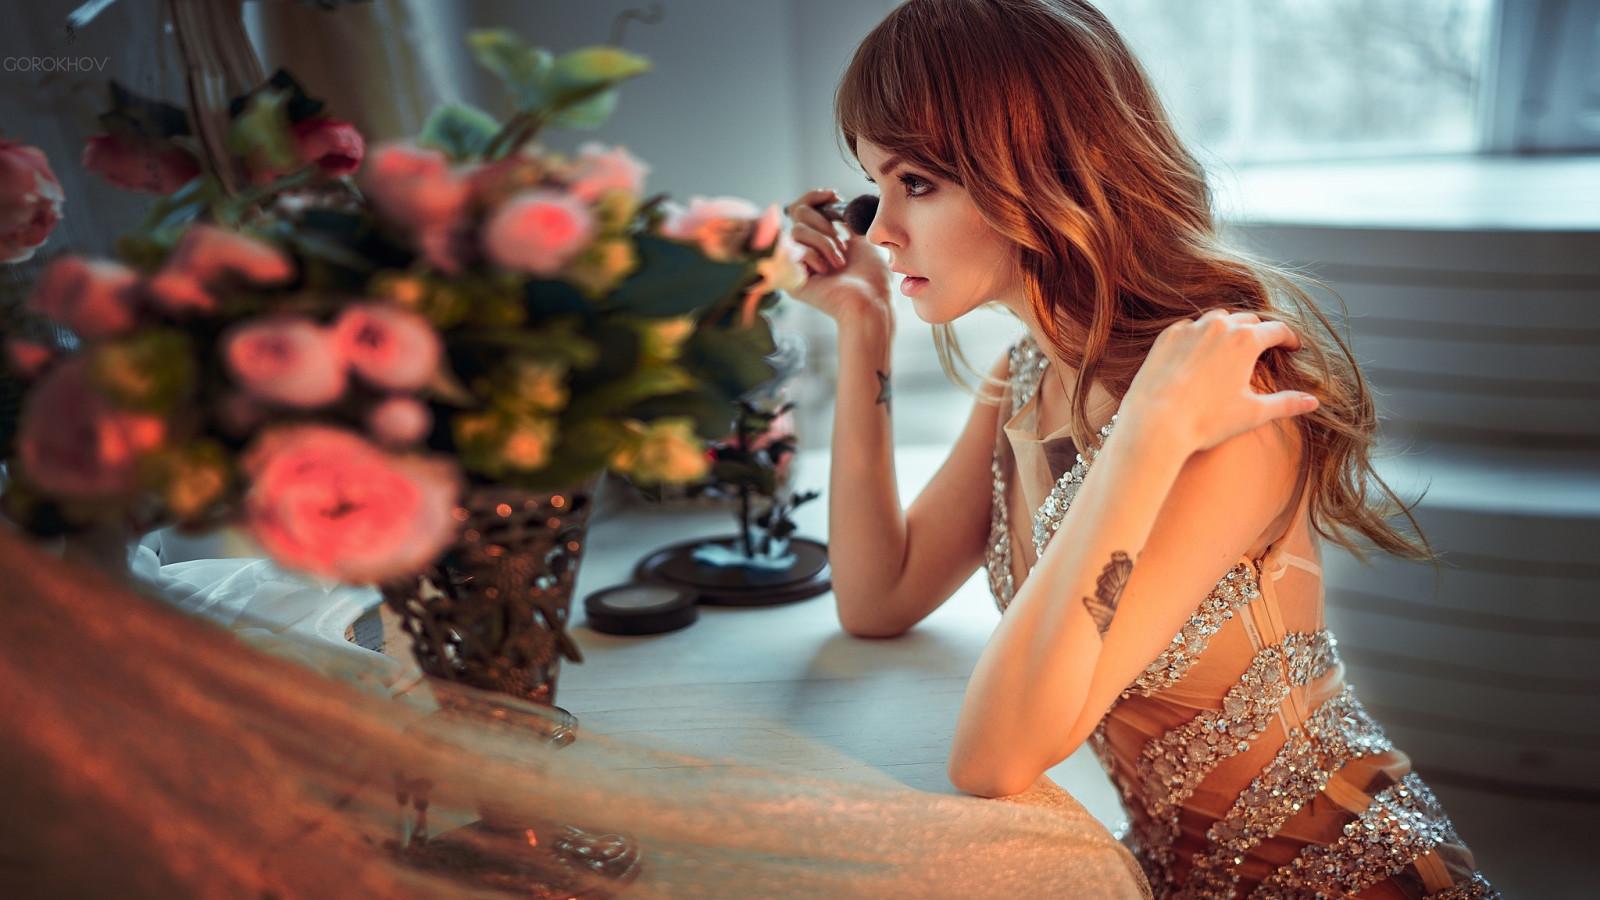 Ivan Gorokhov, Anastasia Scheglova, women, model, long hair, wavy hair, blonde, face, tattoo, dress, depth of field, makeup brush